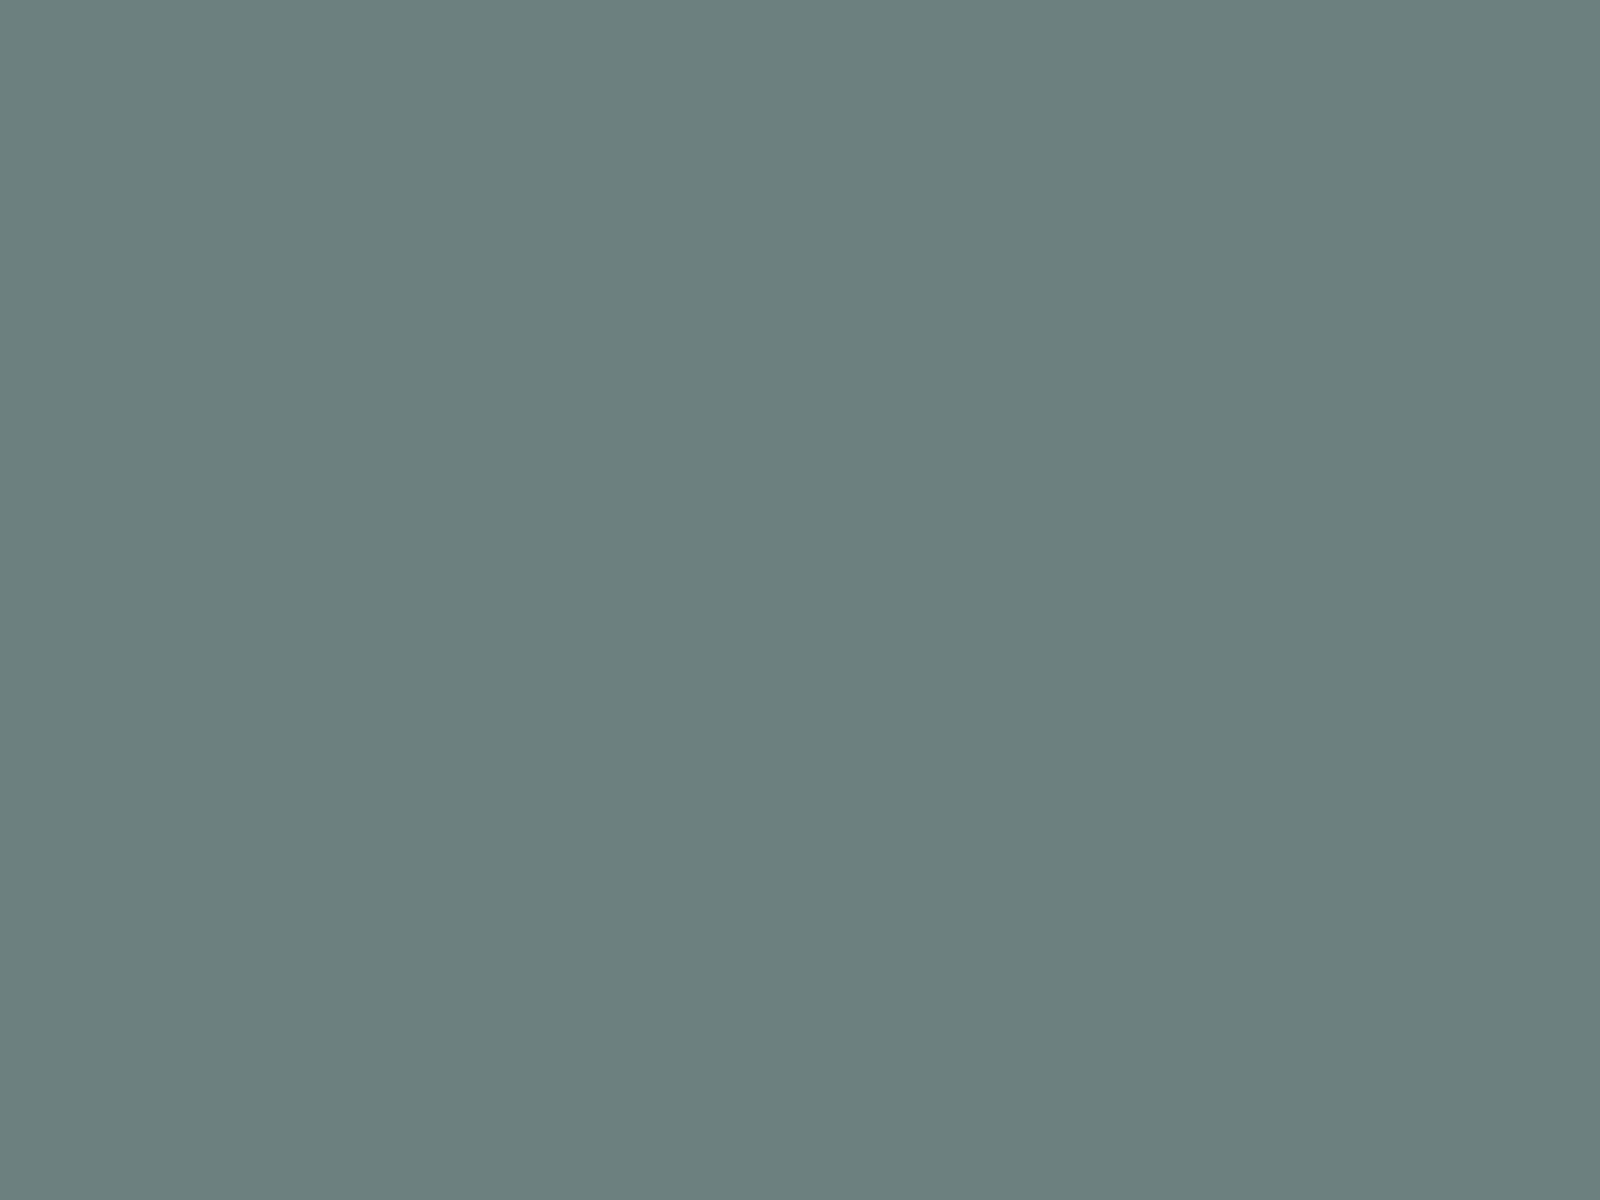 1600x1200 AuroMetalSaurus Solid Color Background